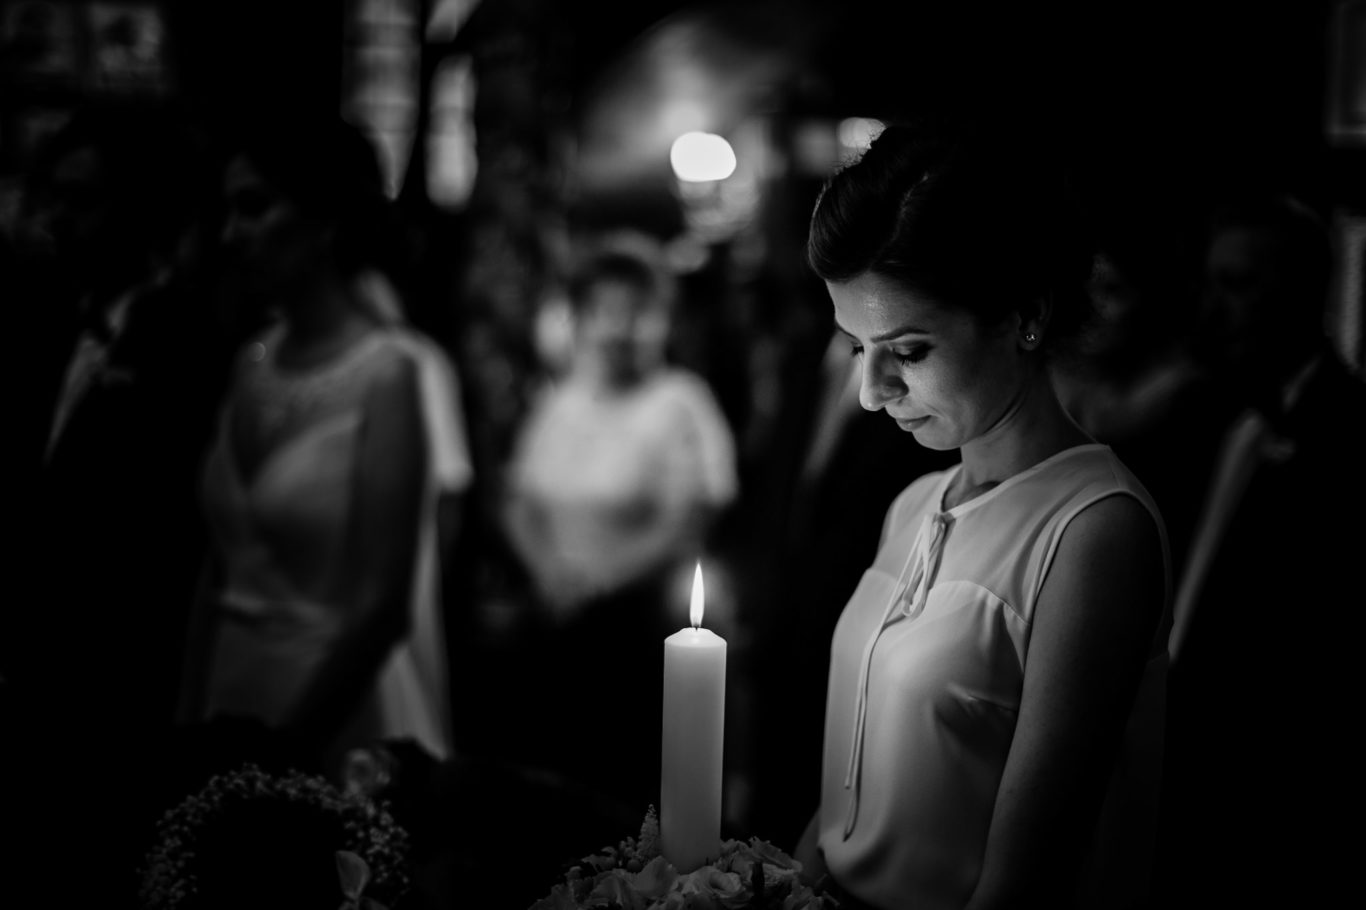 0342-Fotografie-nunta-Bucuresti-Oana-Catalin-fotograf-Ciprian-Dumitrescu-CDF_0520